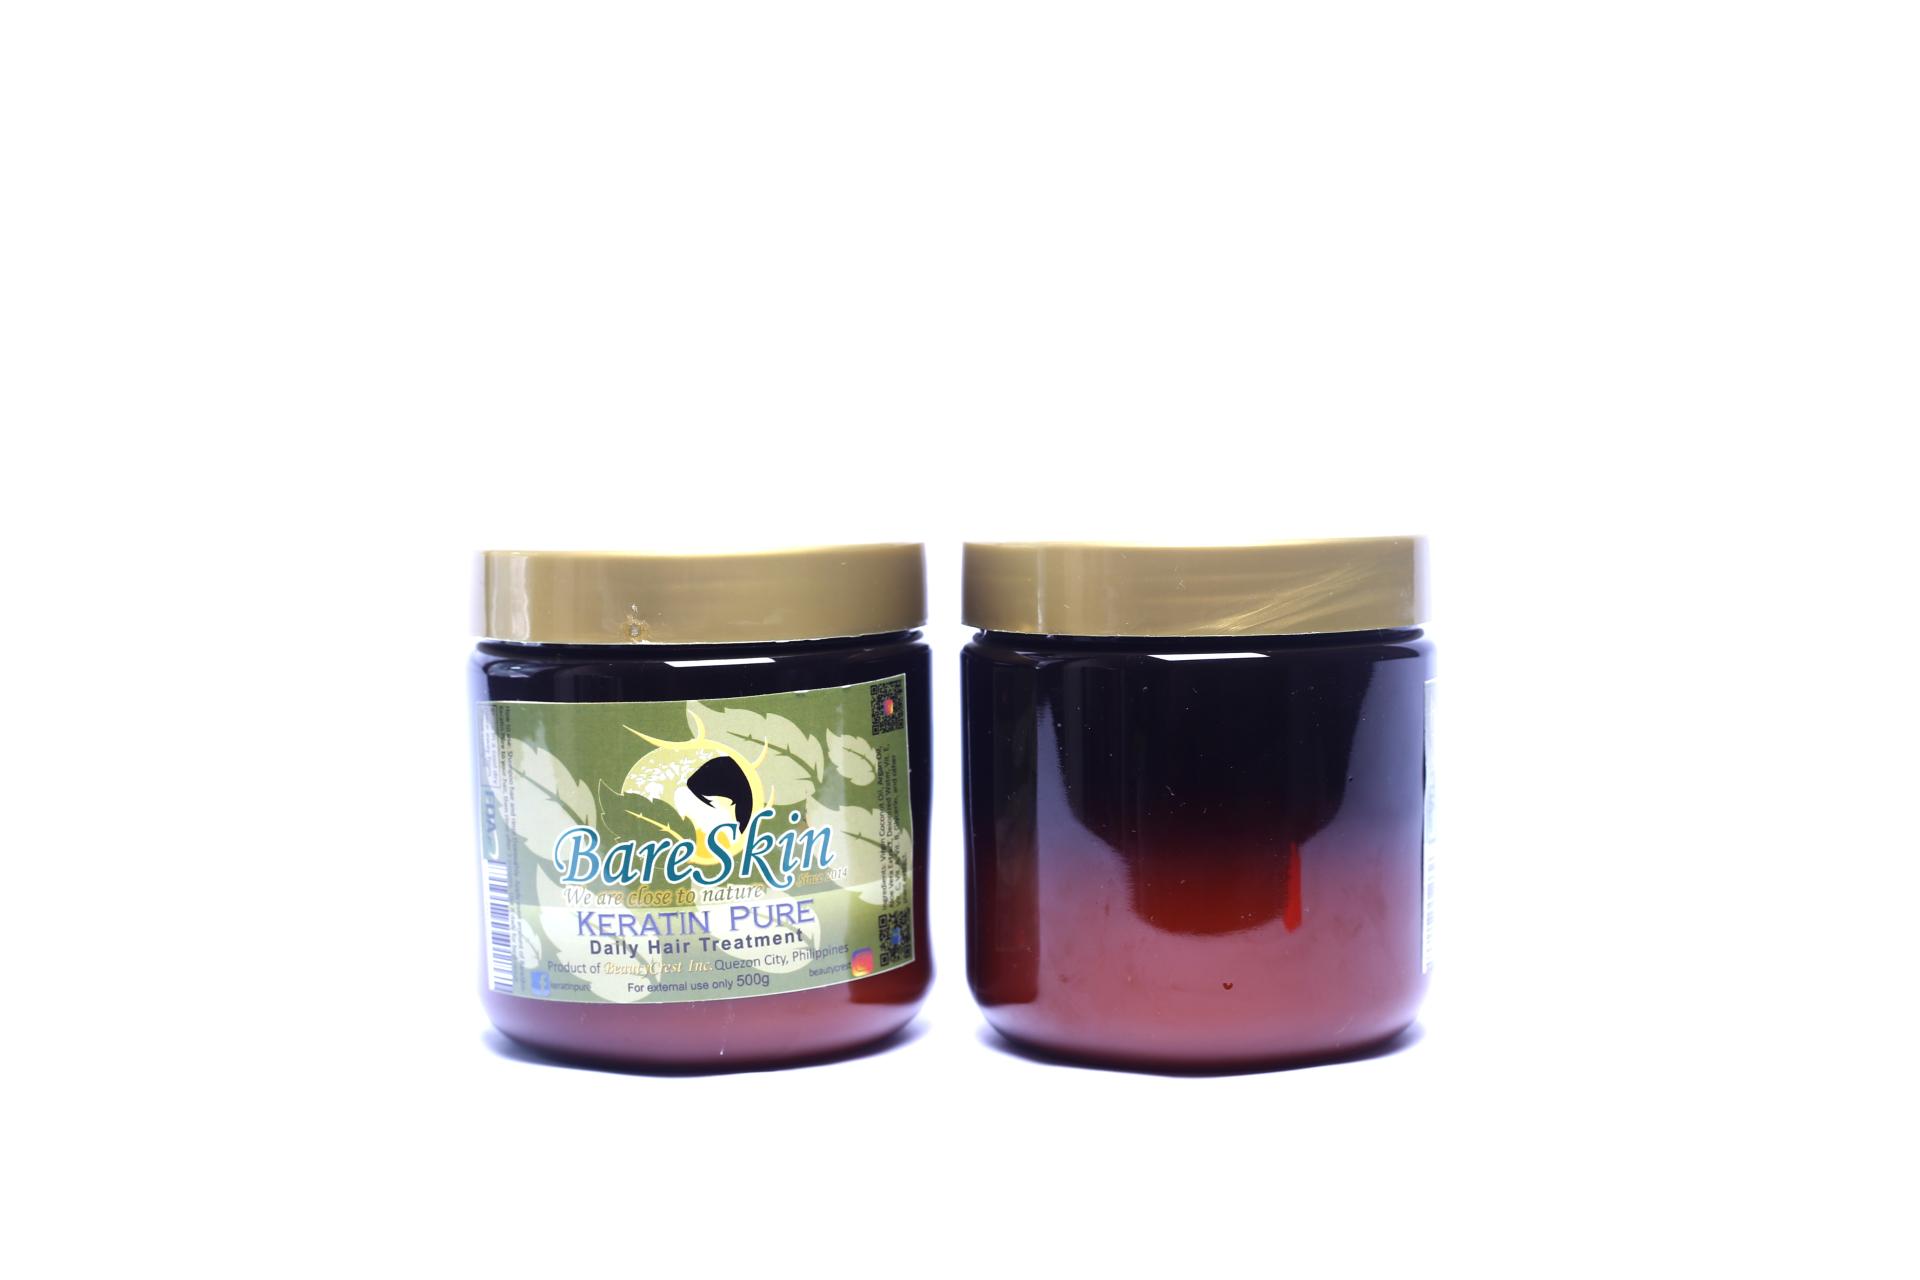 Bareskin Keratin Pure (500g, 150g, 100g)